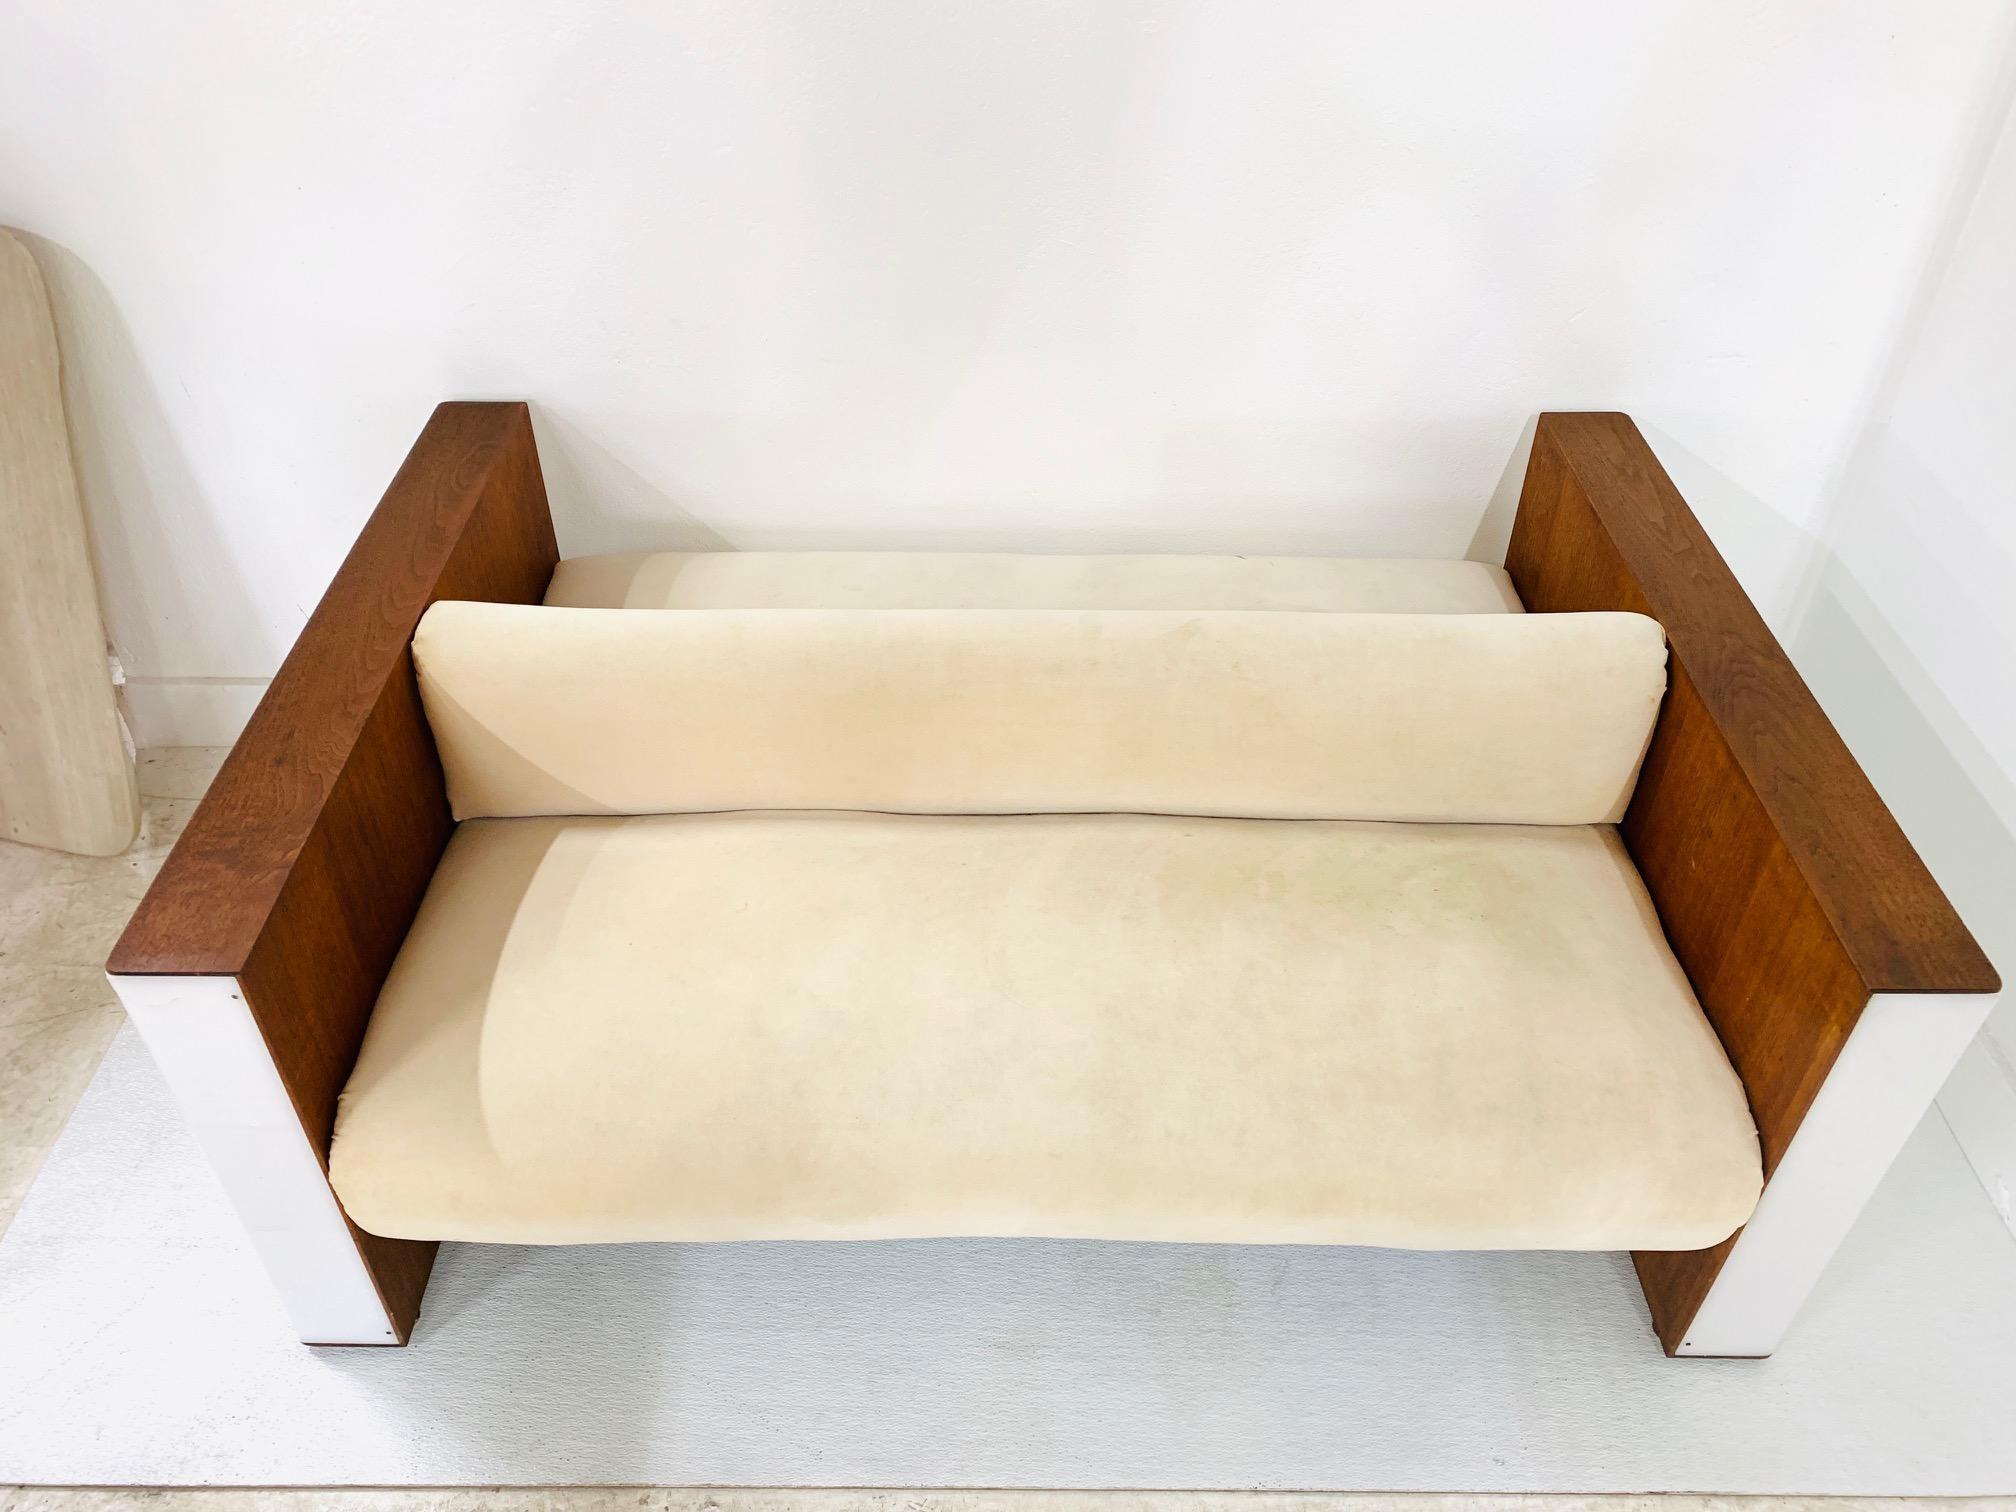 vladimir kagan illuminated double sided sofa